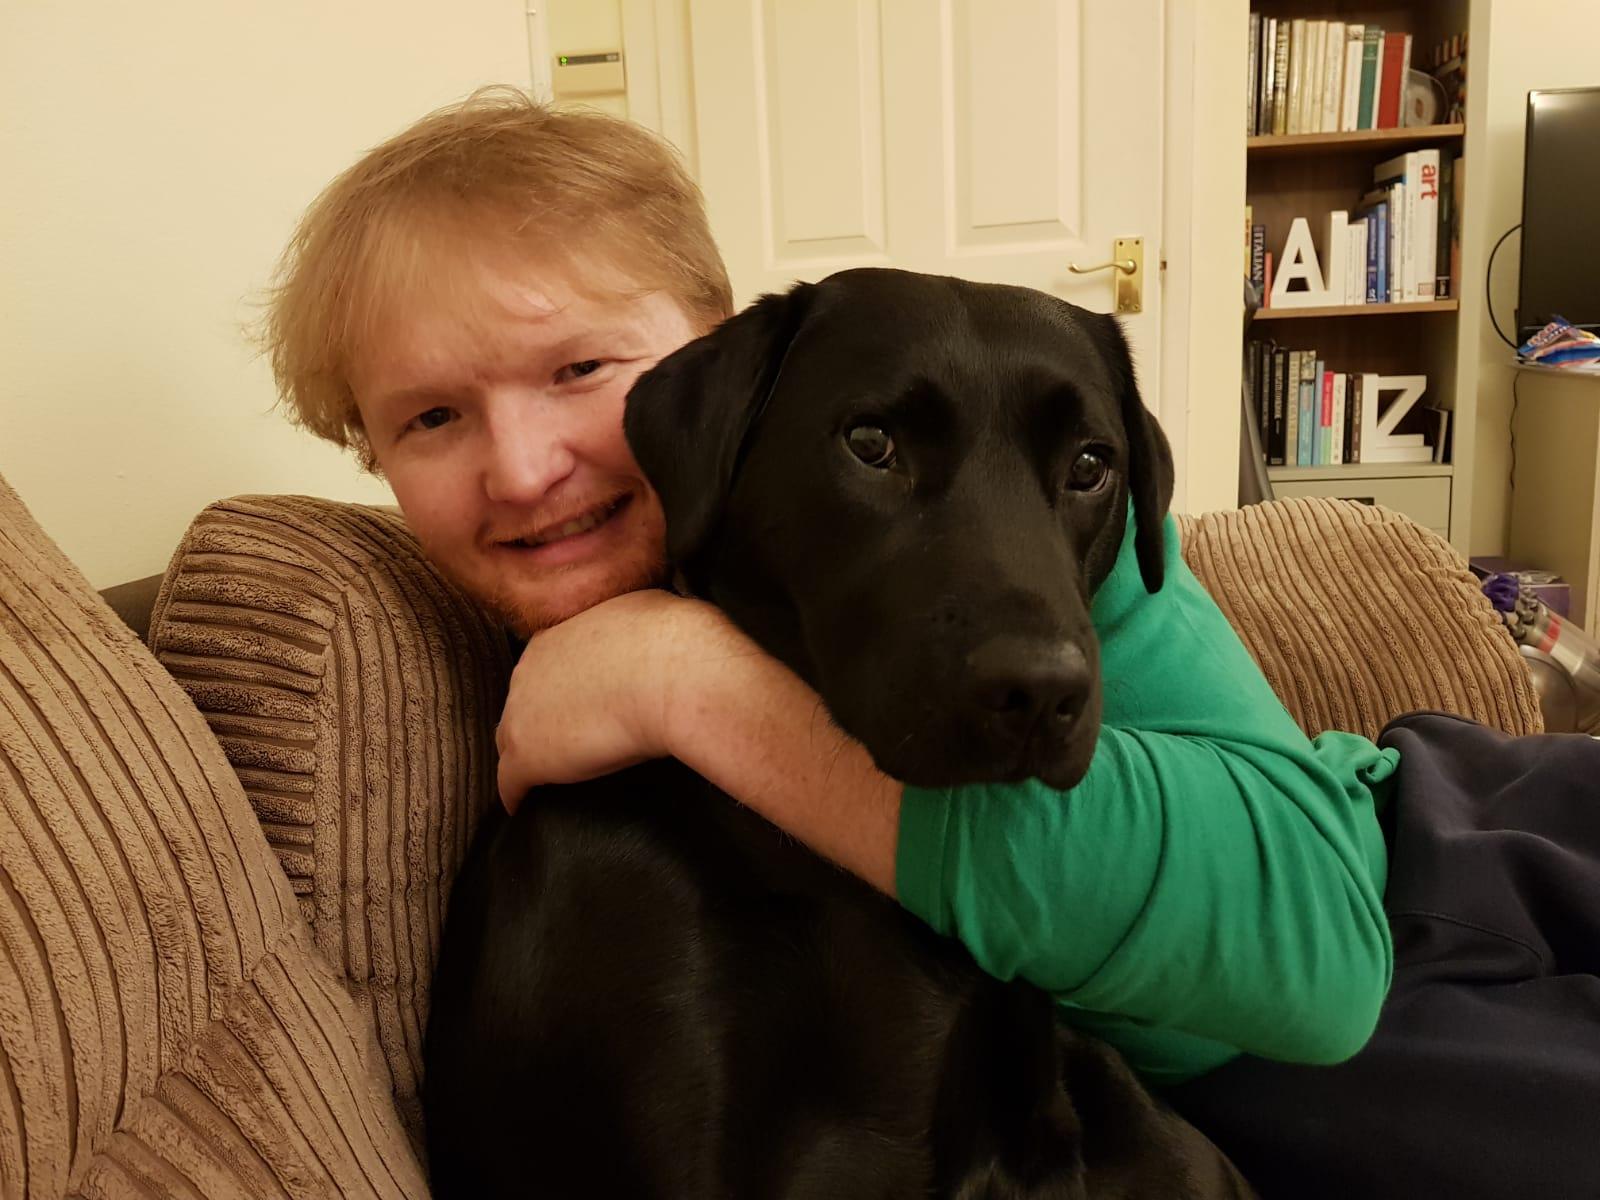 Photo of Nathan cuddling black labrador guide dog Maisie on sofa.